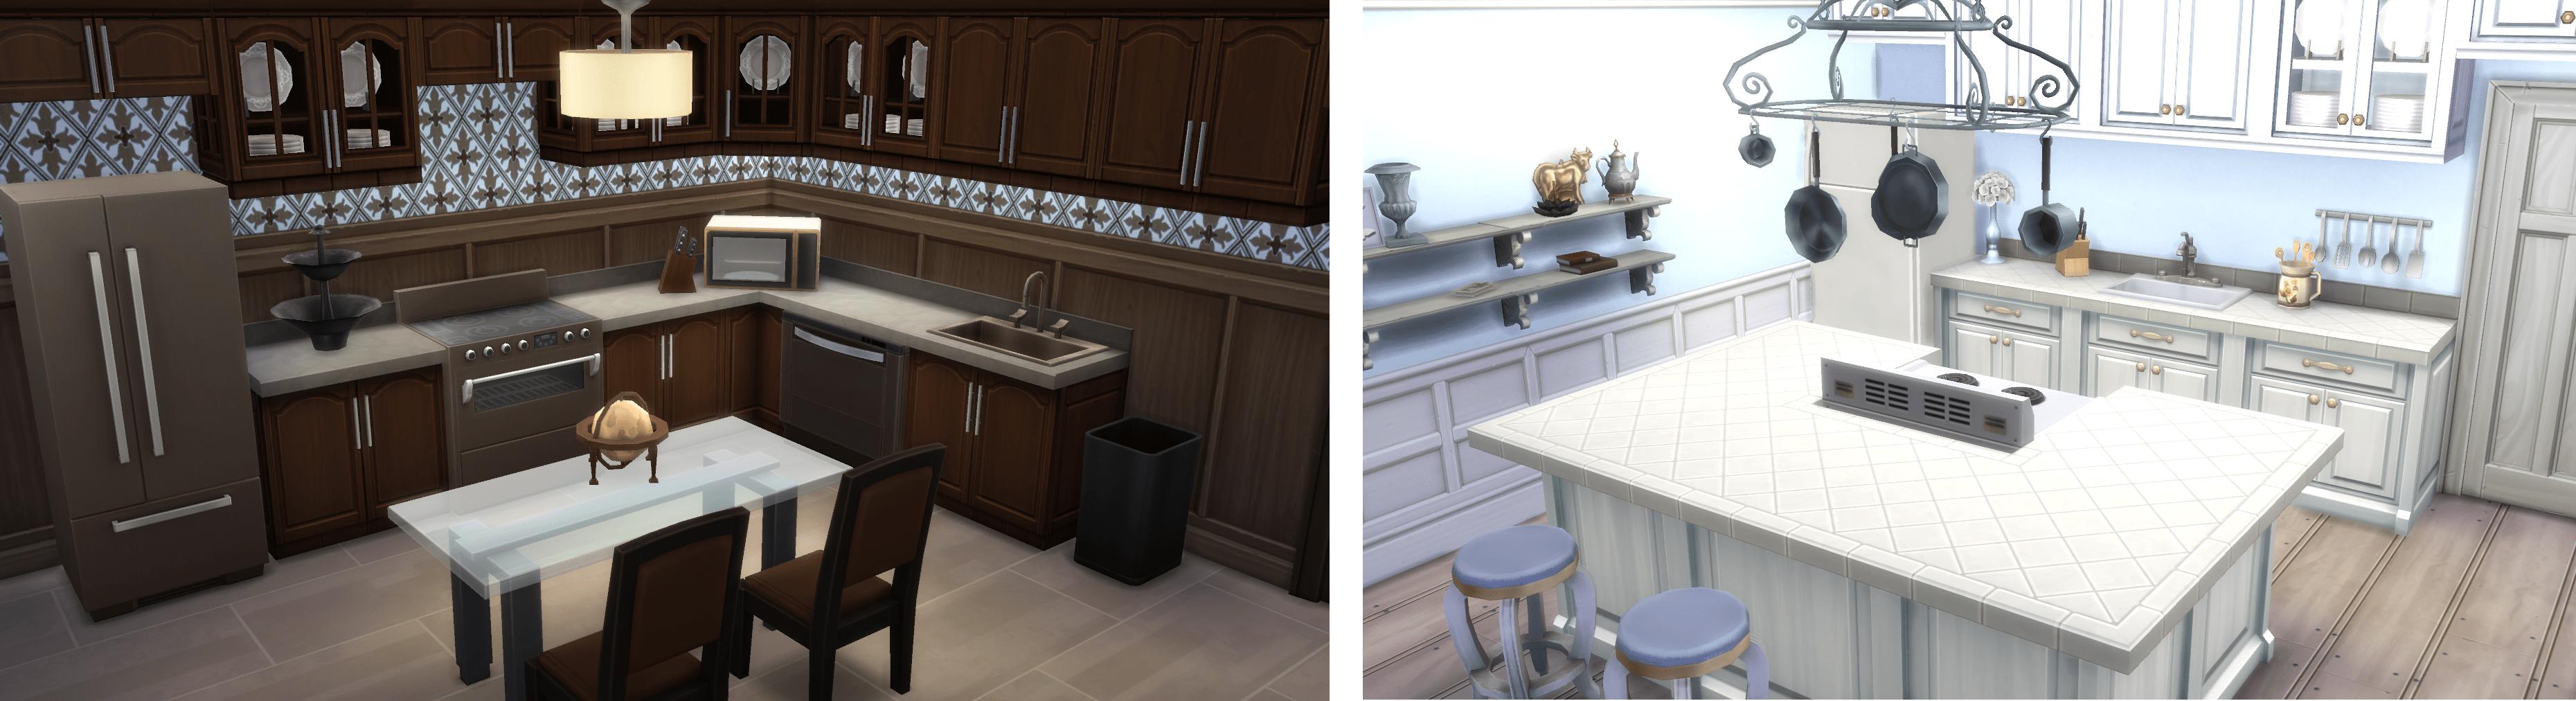 L Shaped Kitchen Design Layout